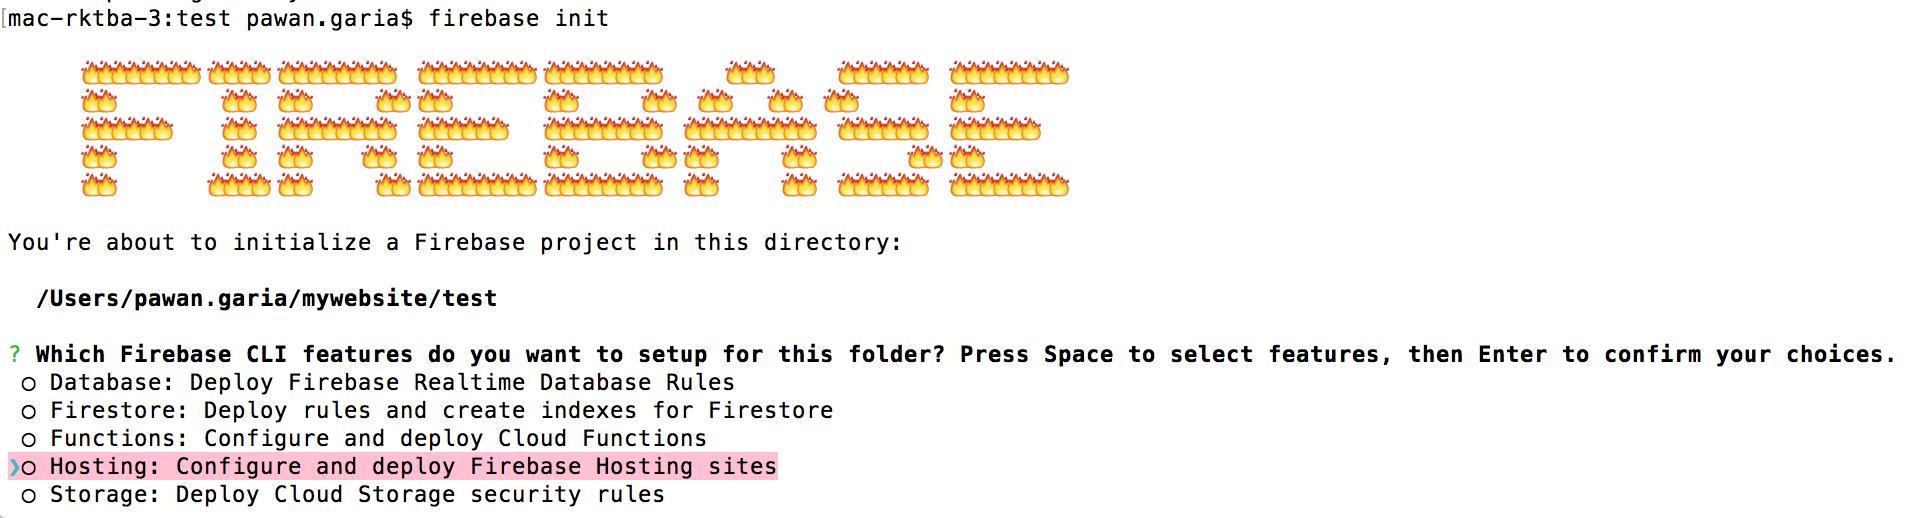 google-fireBase-init-website-command